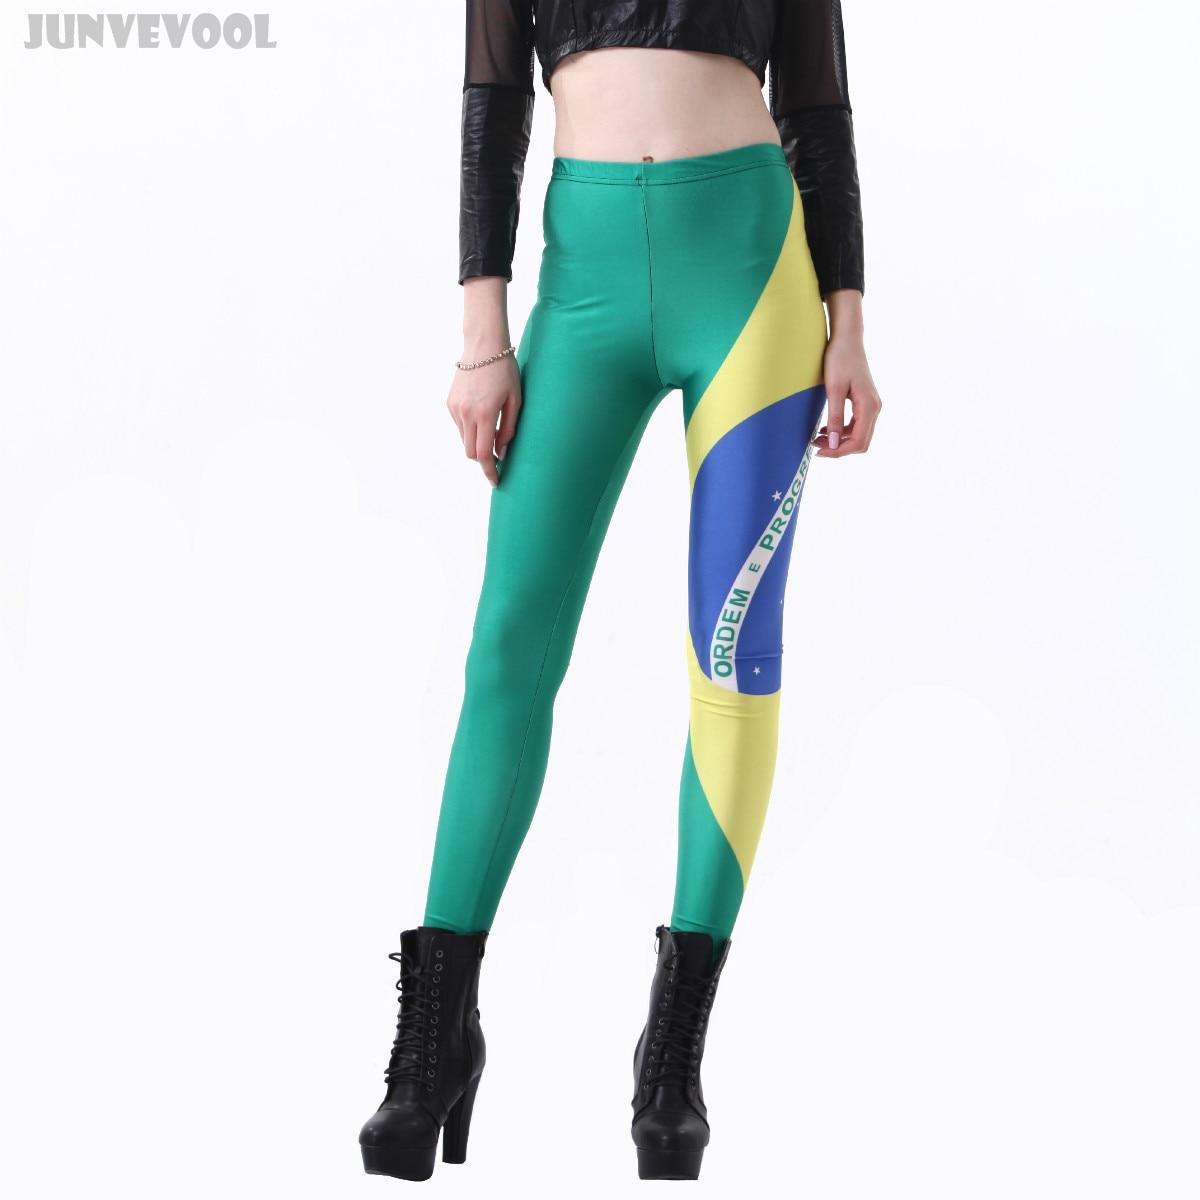 Brazilian Flag Leggings Harajuku 3D Printed Leggings Women Sexy Slim Leg Fitness Slim Sportswear Hot Ankle Length Tattoo Pants